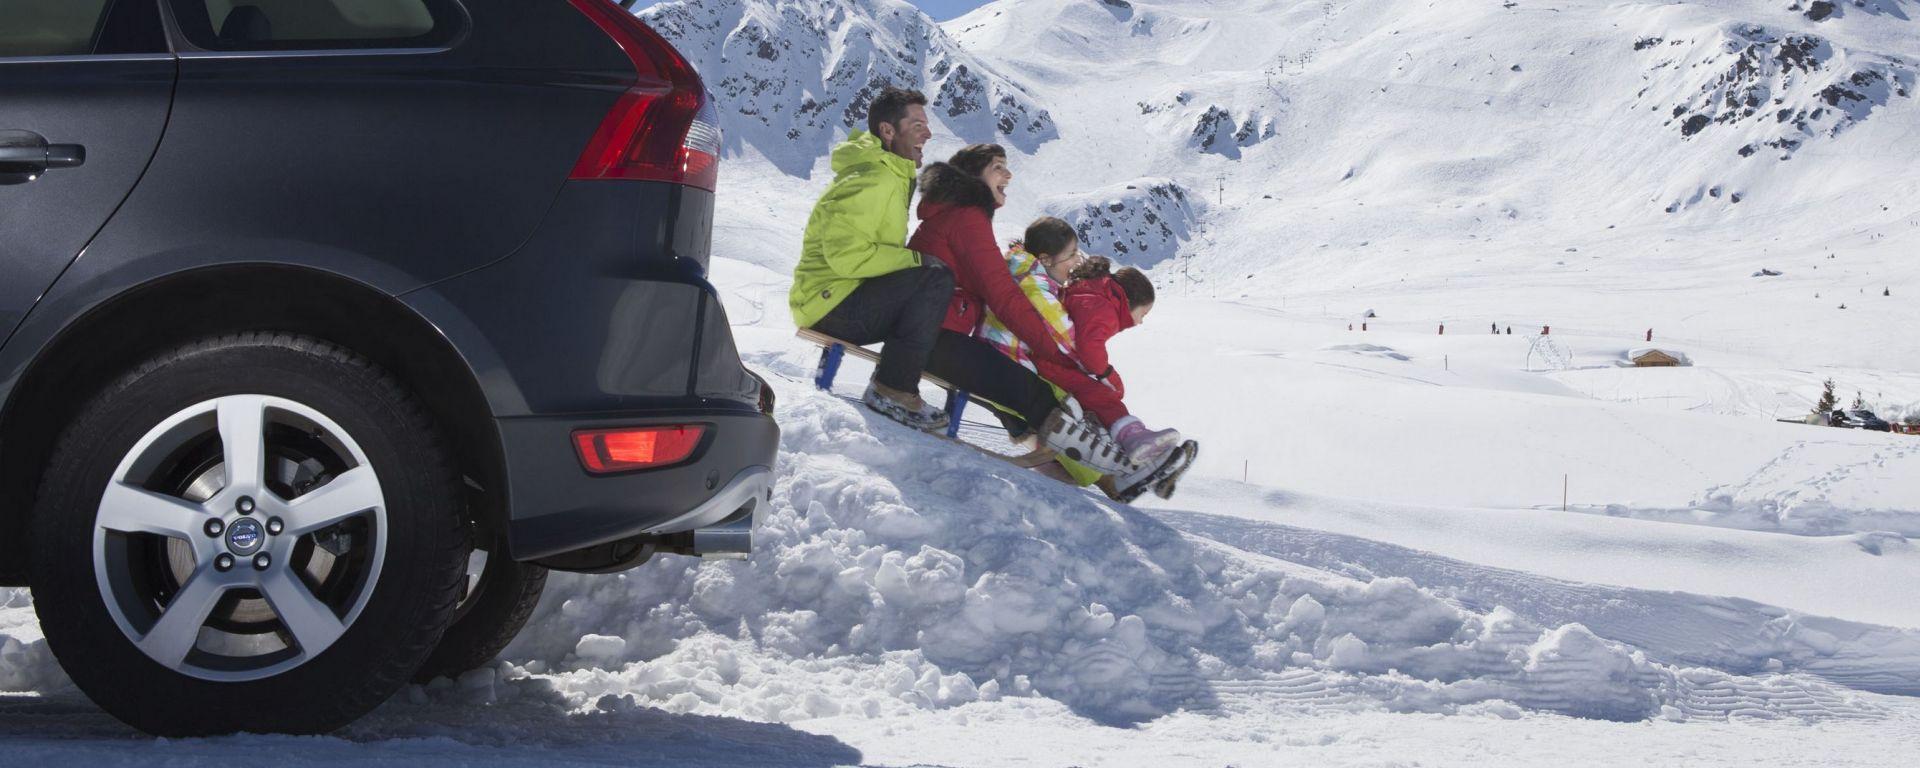 Europcar Winter Programme